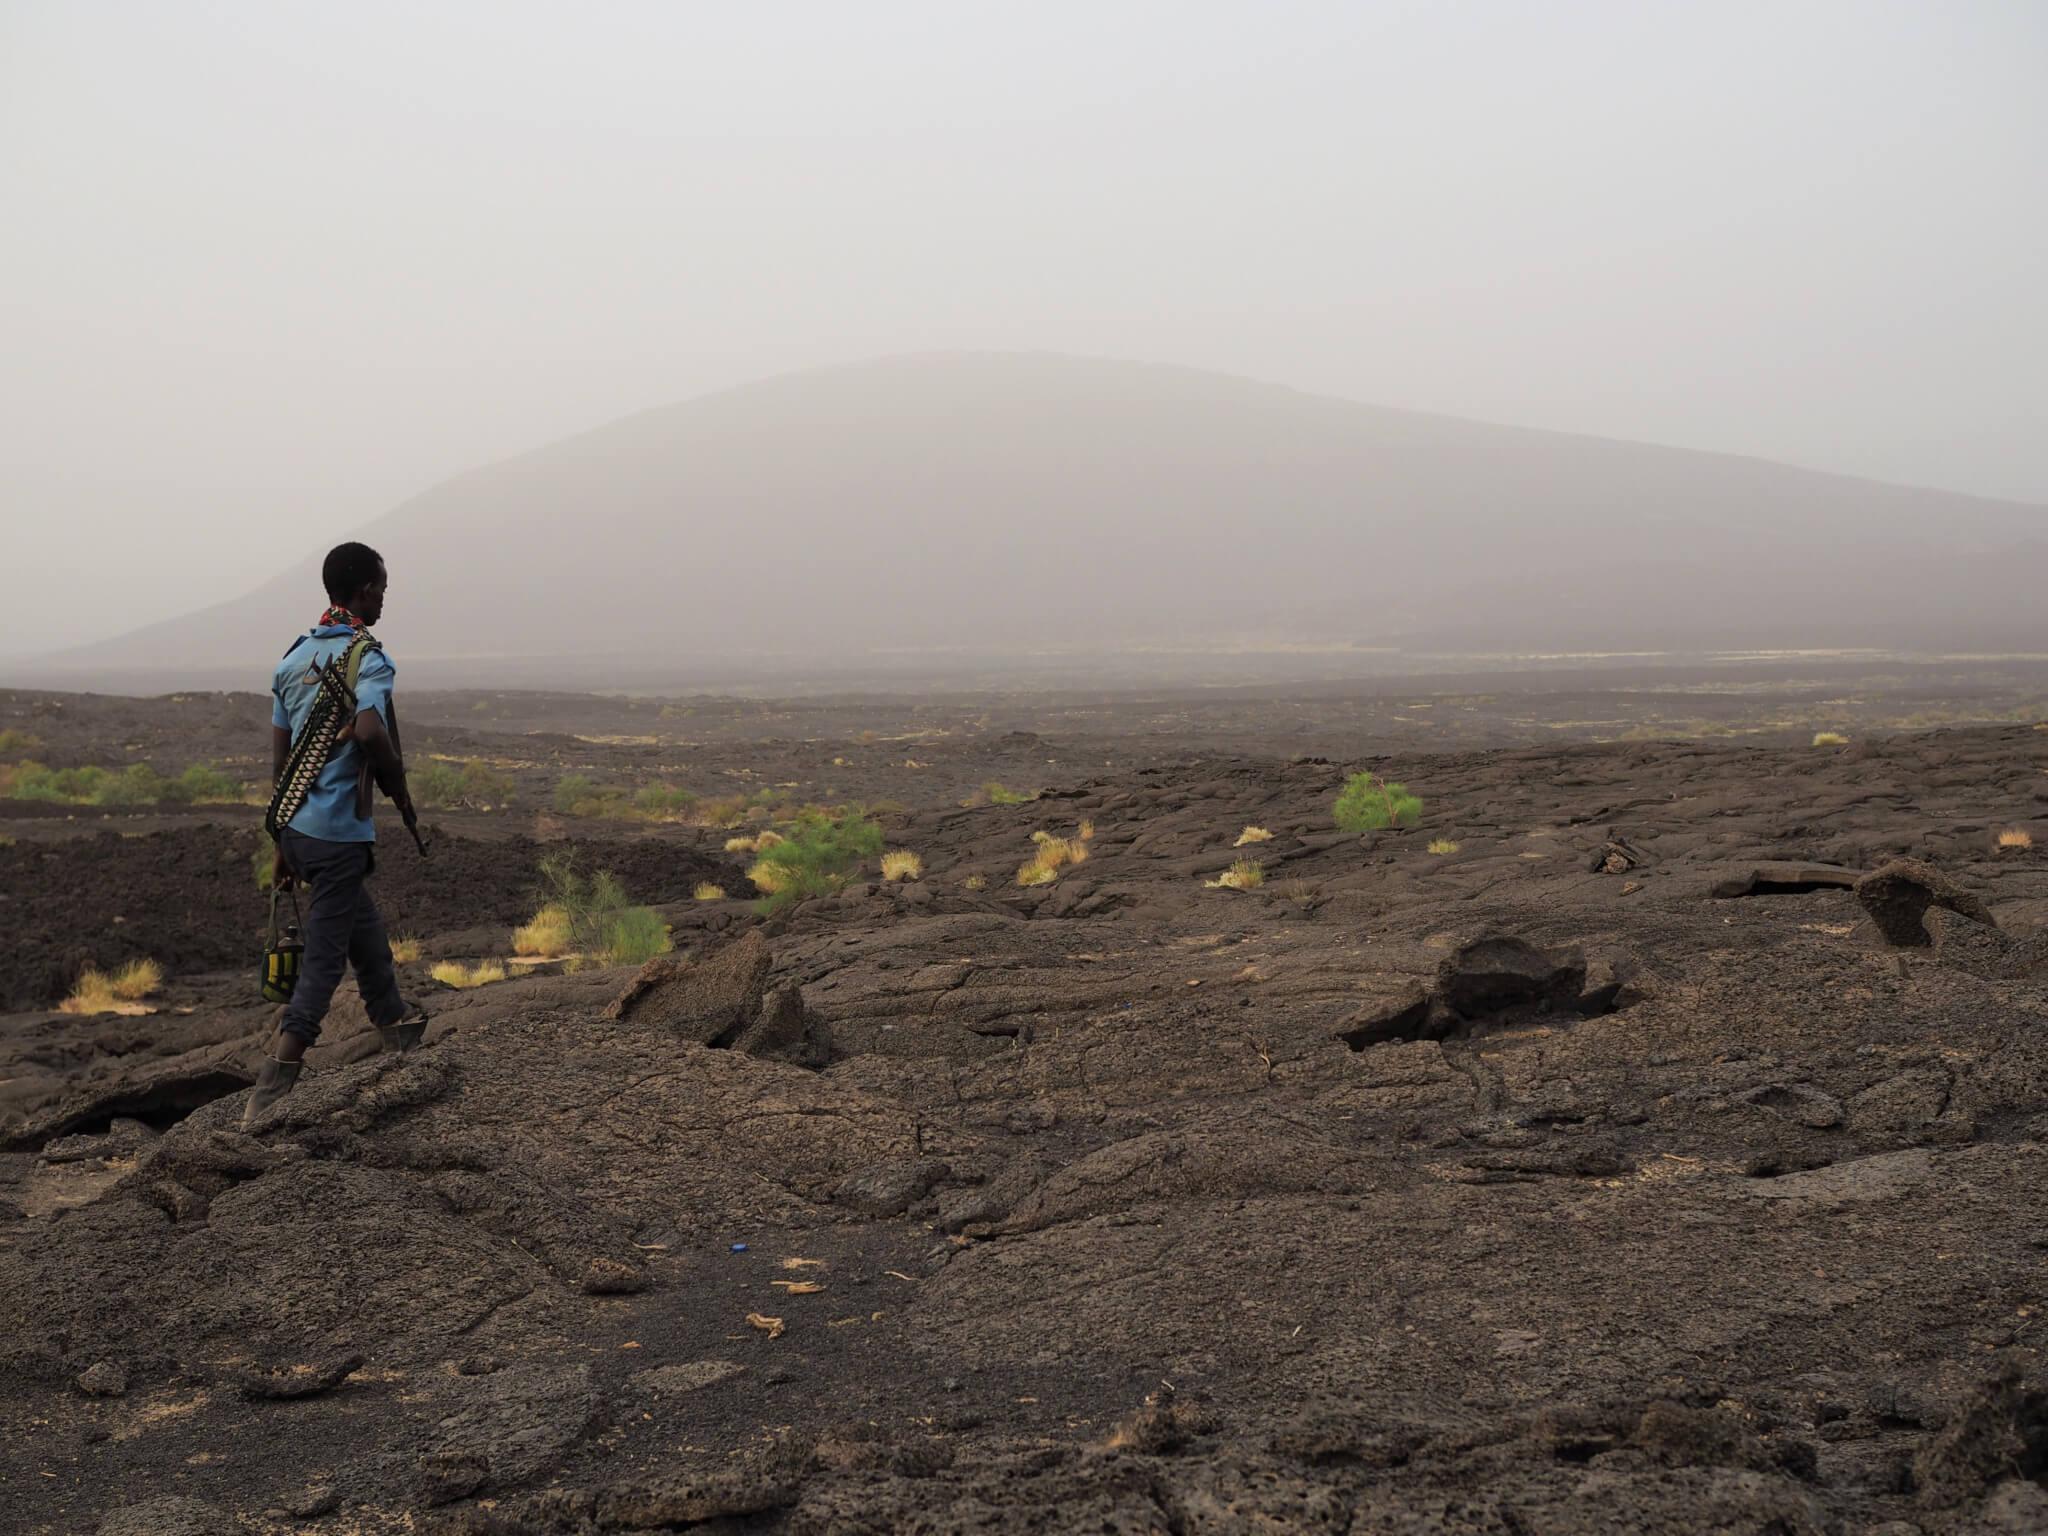 Ethiopian adventures: before you go